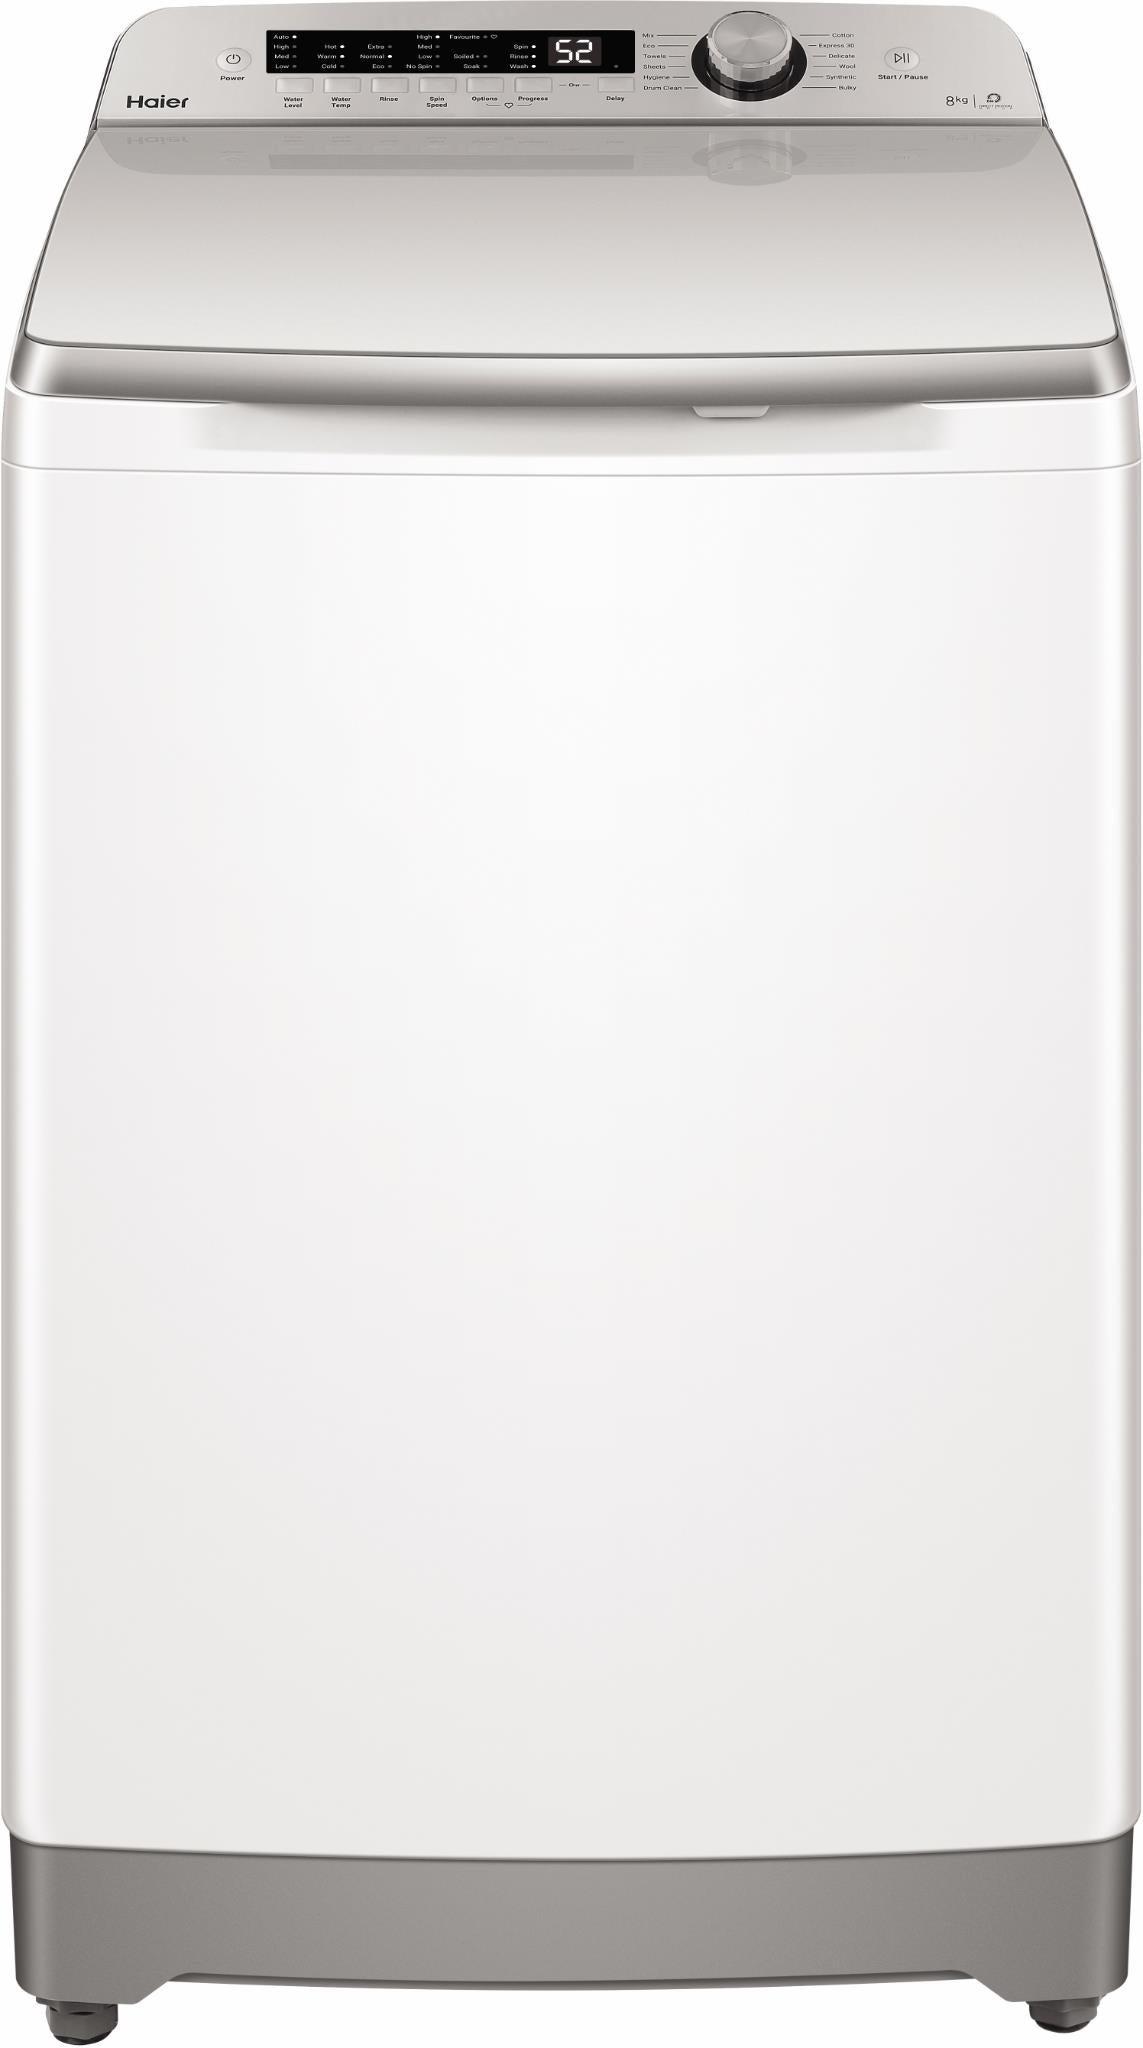 Haier HWT10AN1 Washing Machine